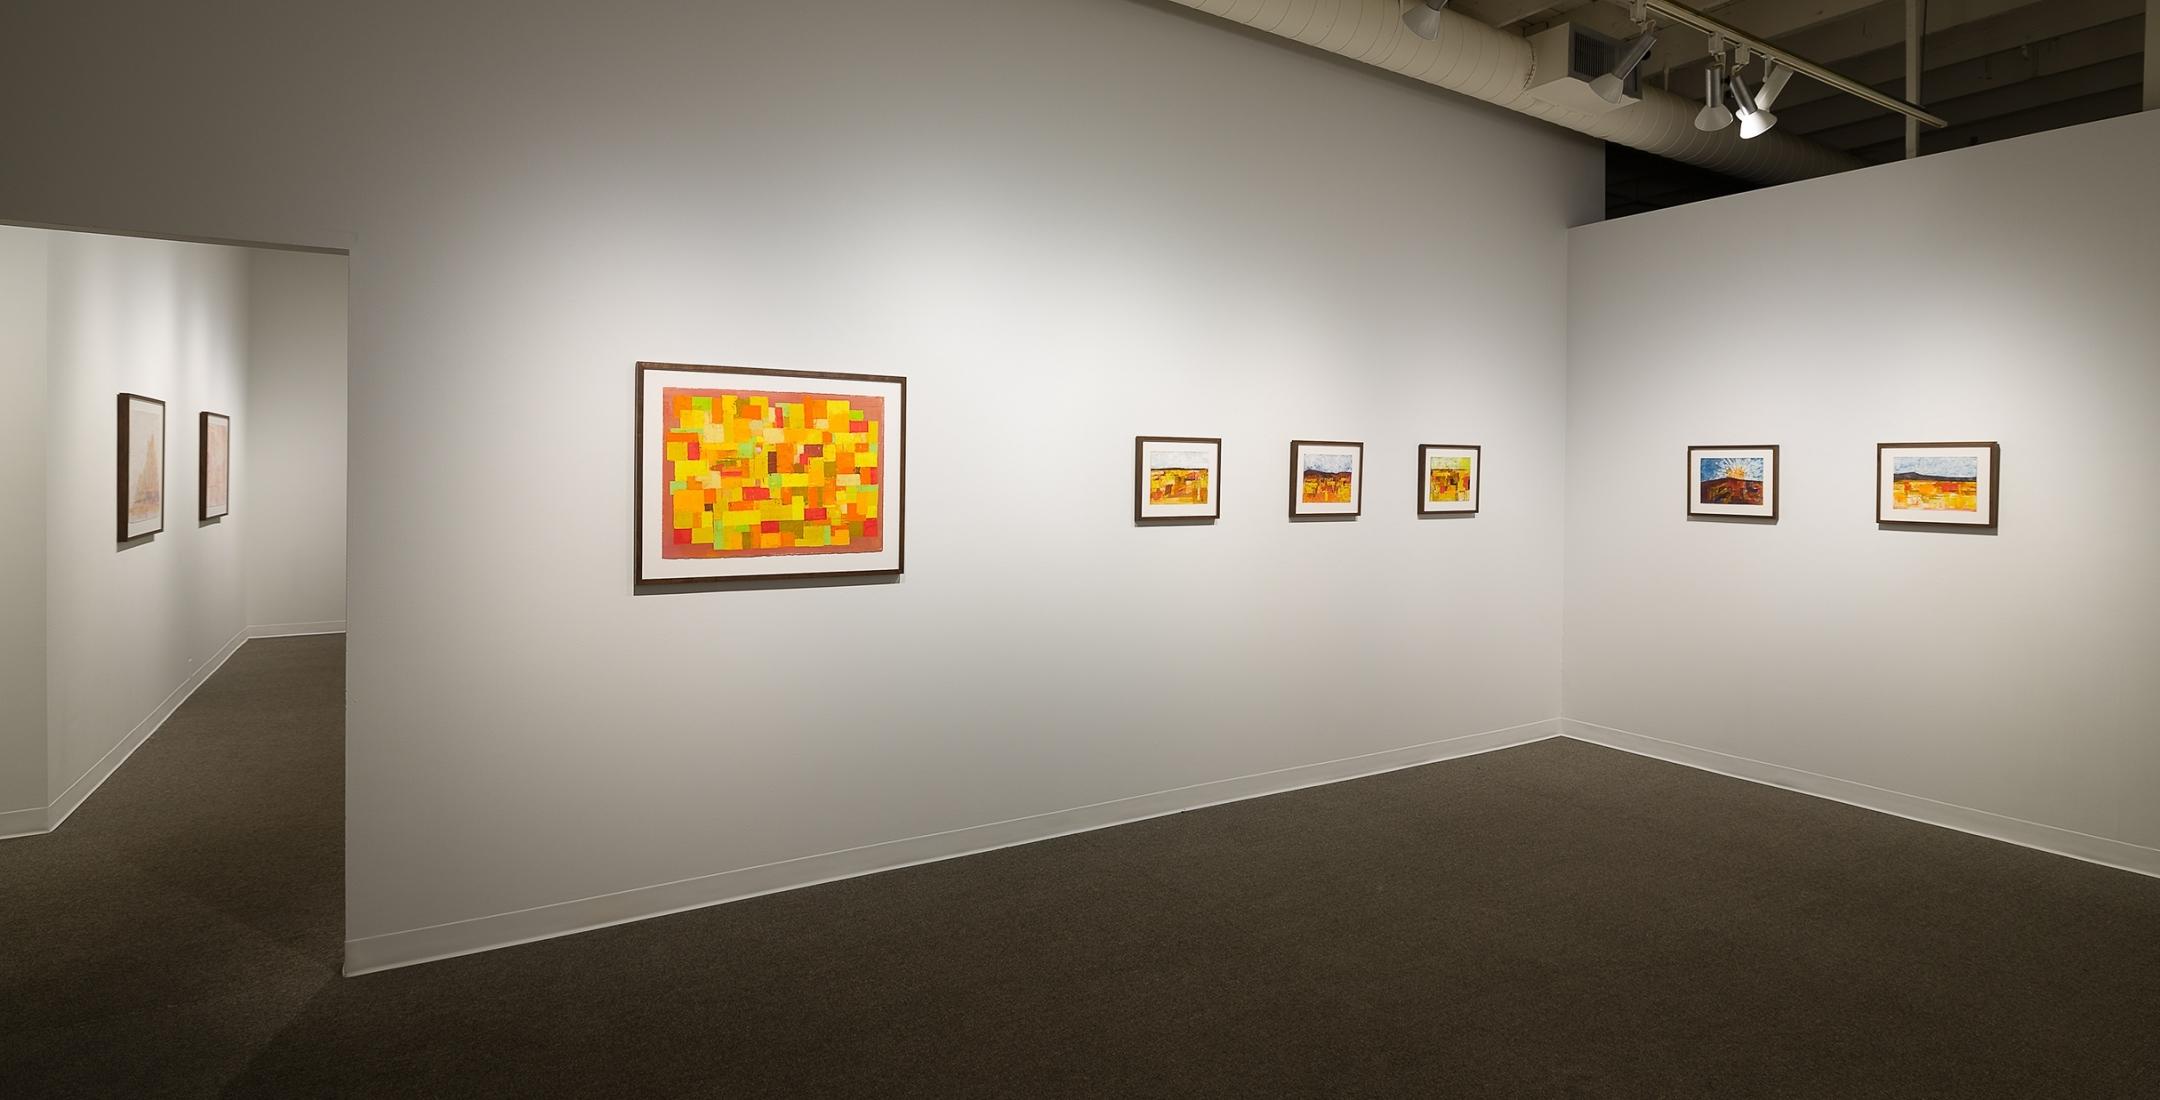 Margot Voorhies Thompson | Desert Light | Russo Lee Gallery | March 2020